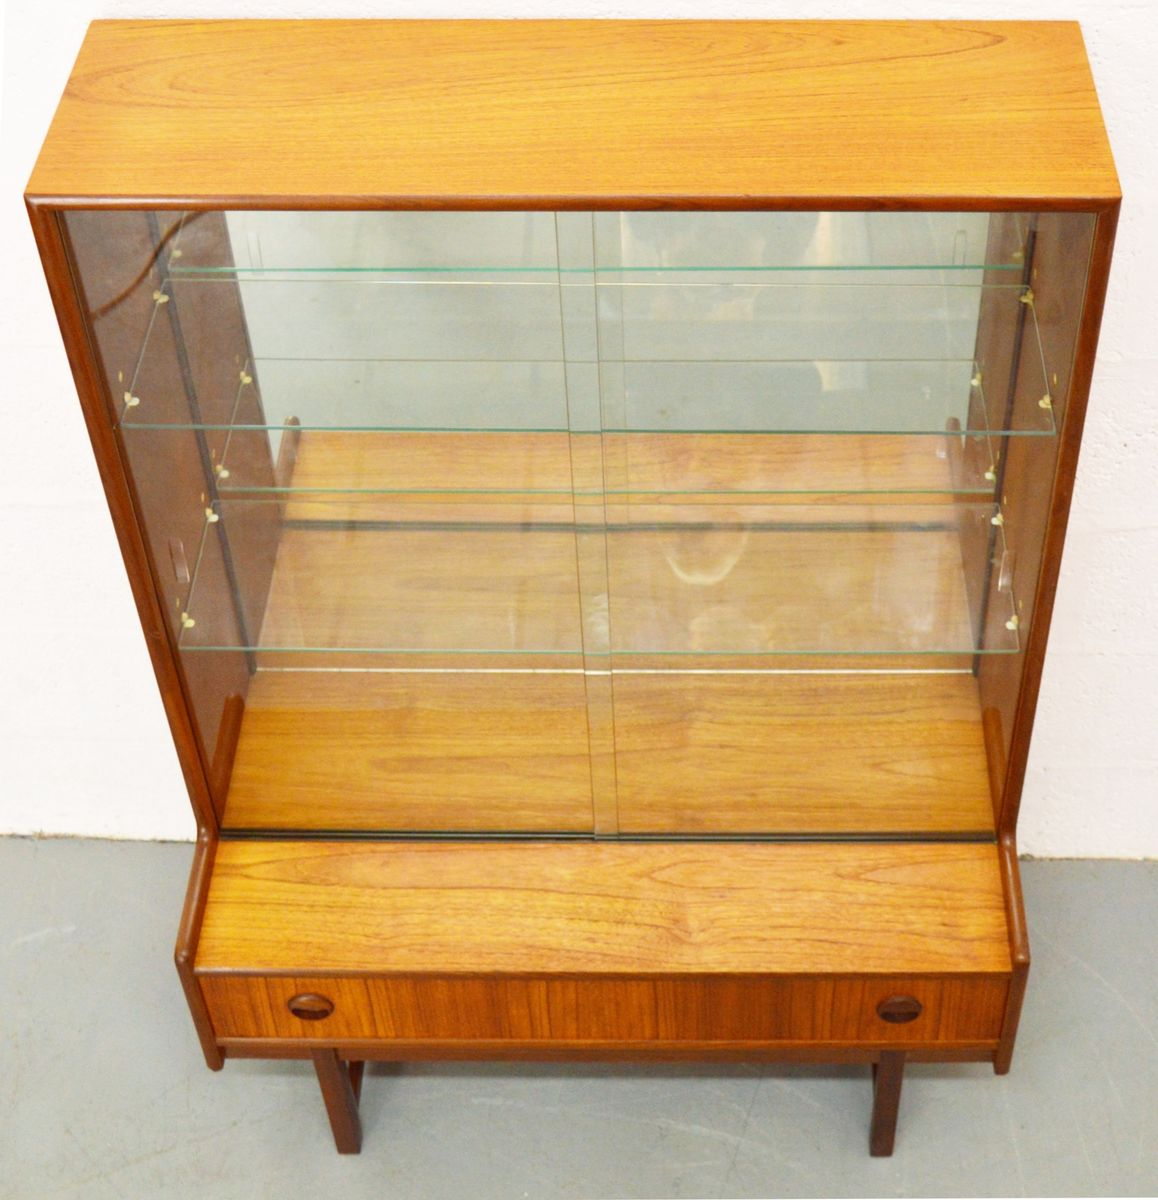 Petit meuble vitrine mid century de turnidge angleterre for Meuble mid century montreal